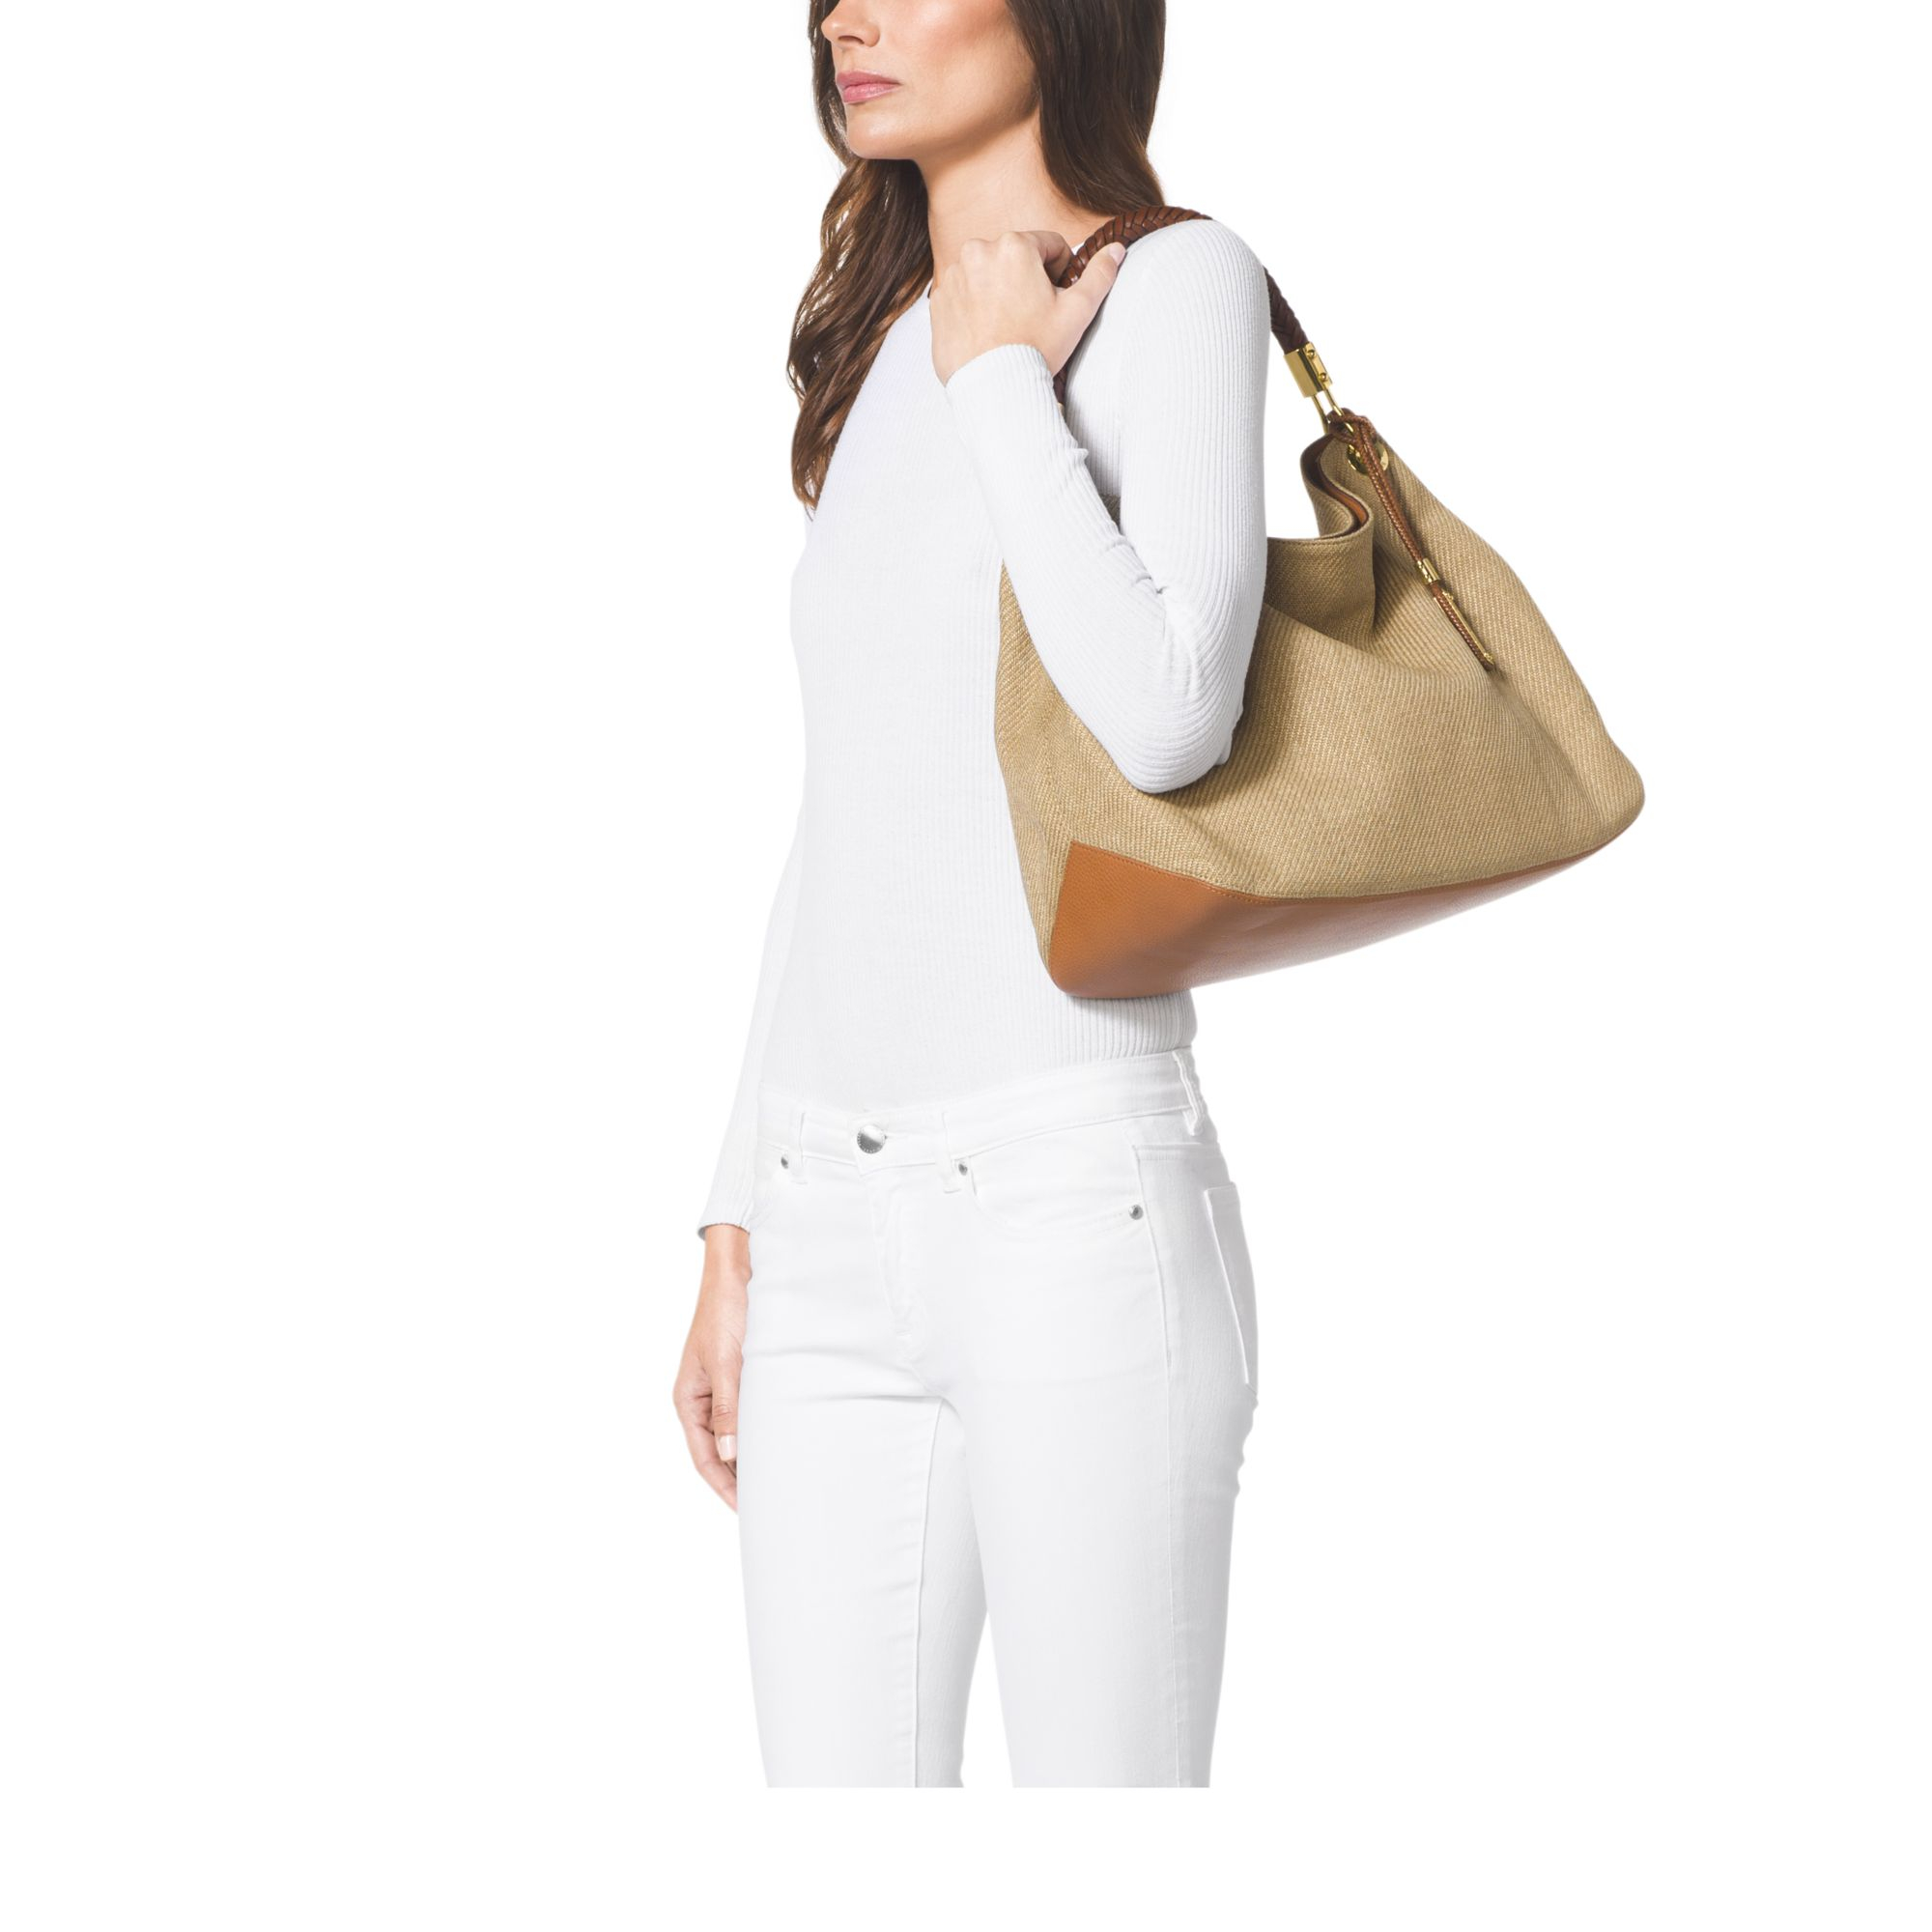 681aa2bbfff1 Lyst - Michael Kors Skorpios Large Woven Shoulder Bag in Metallic